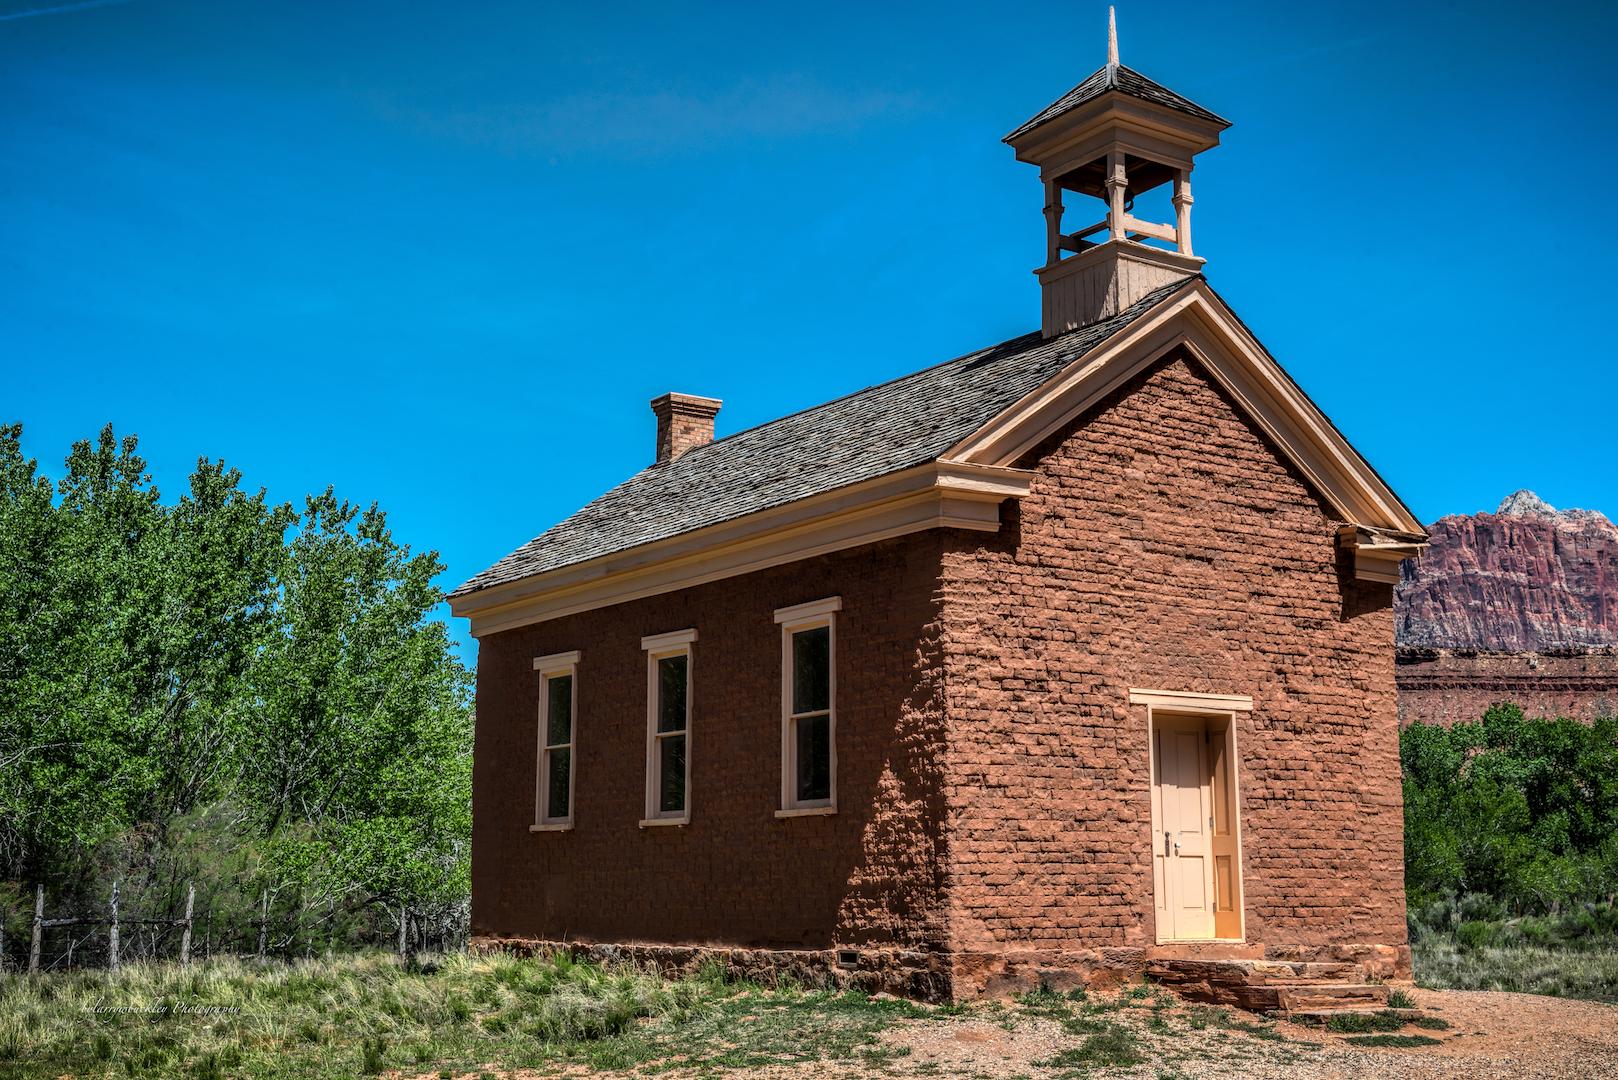 Grafton Adobe Schoolhouse